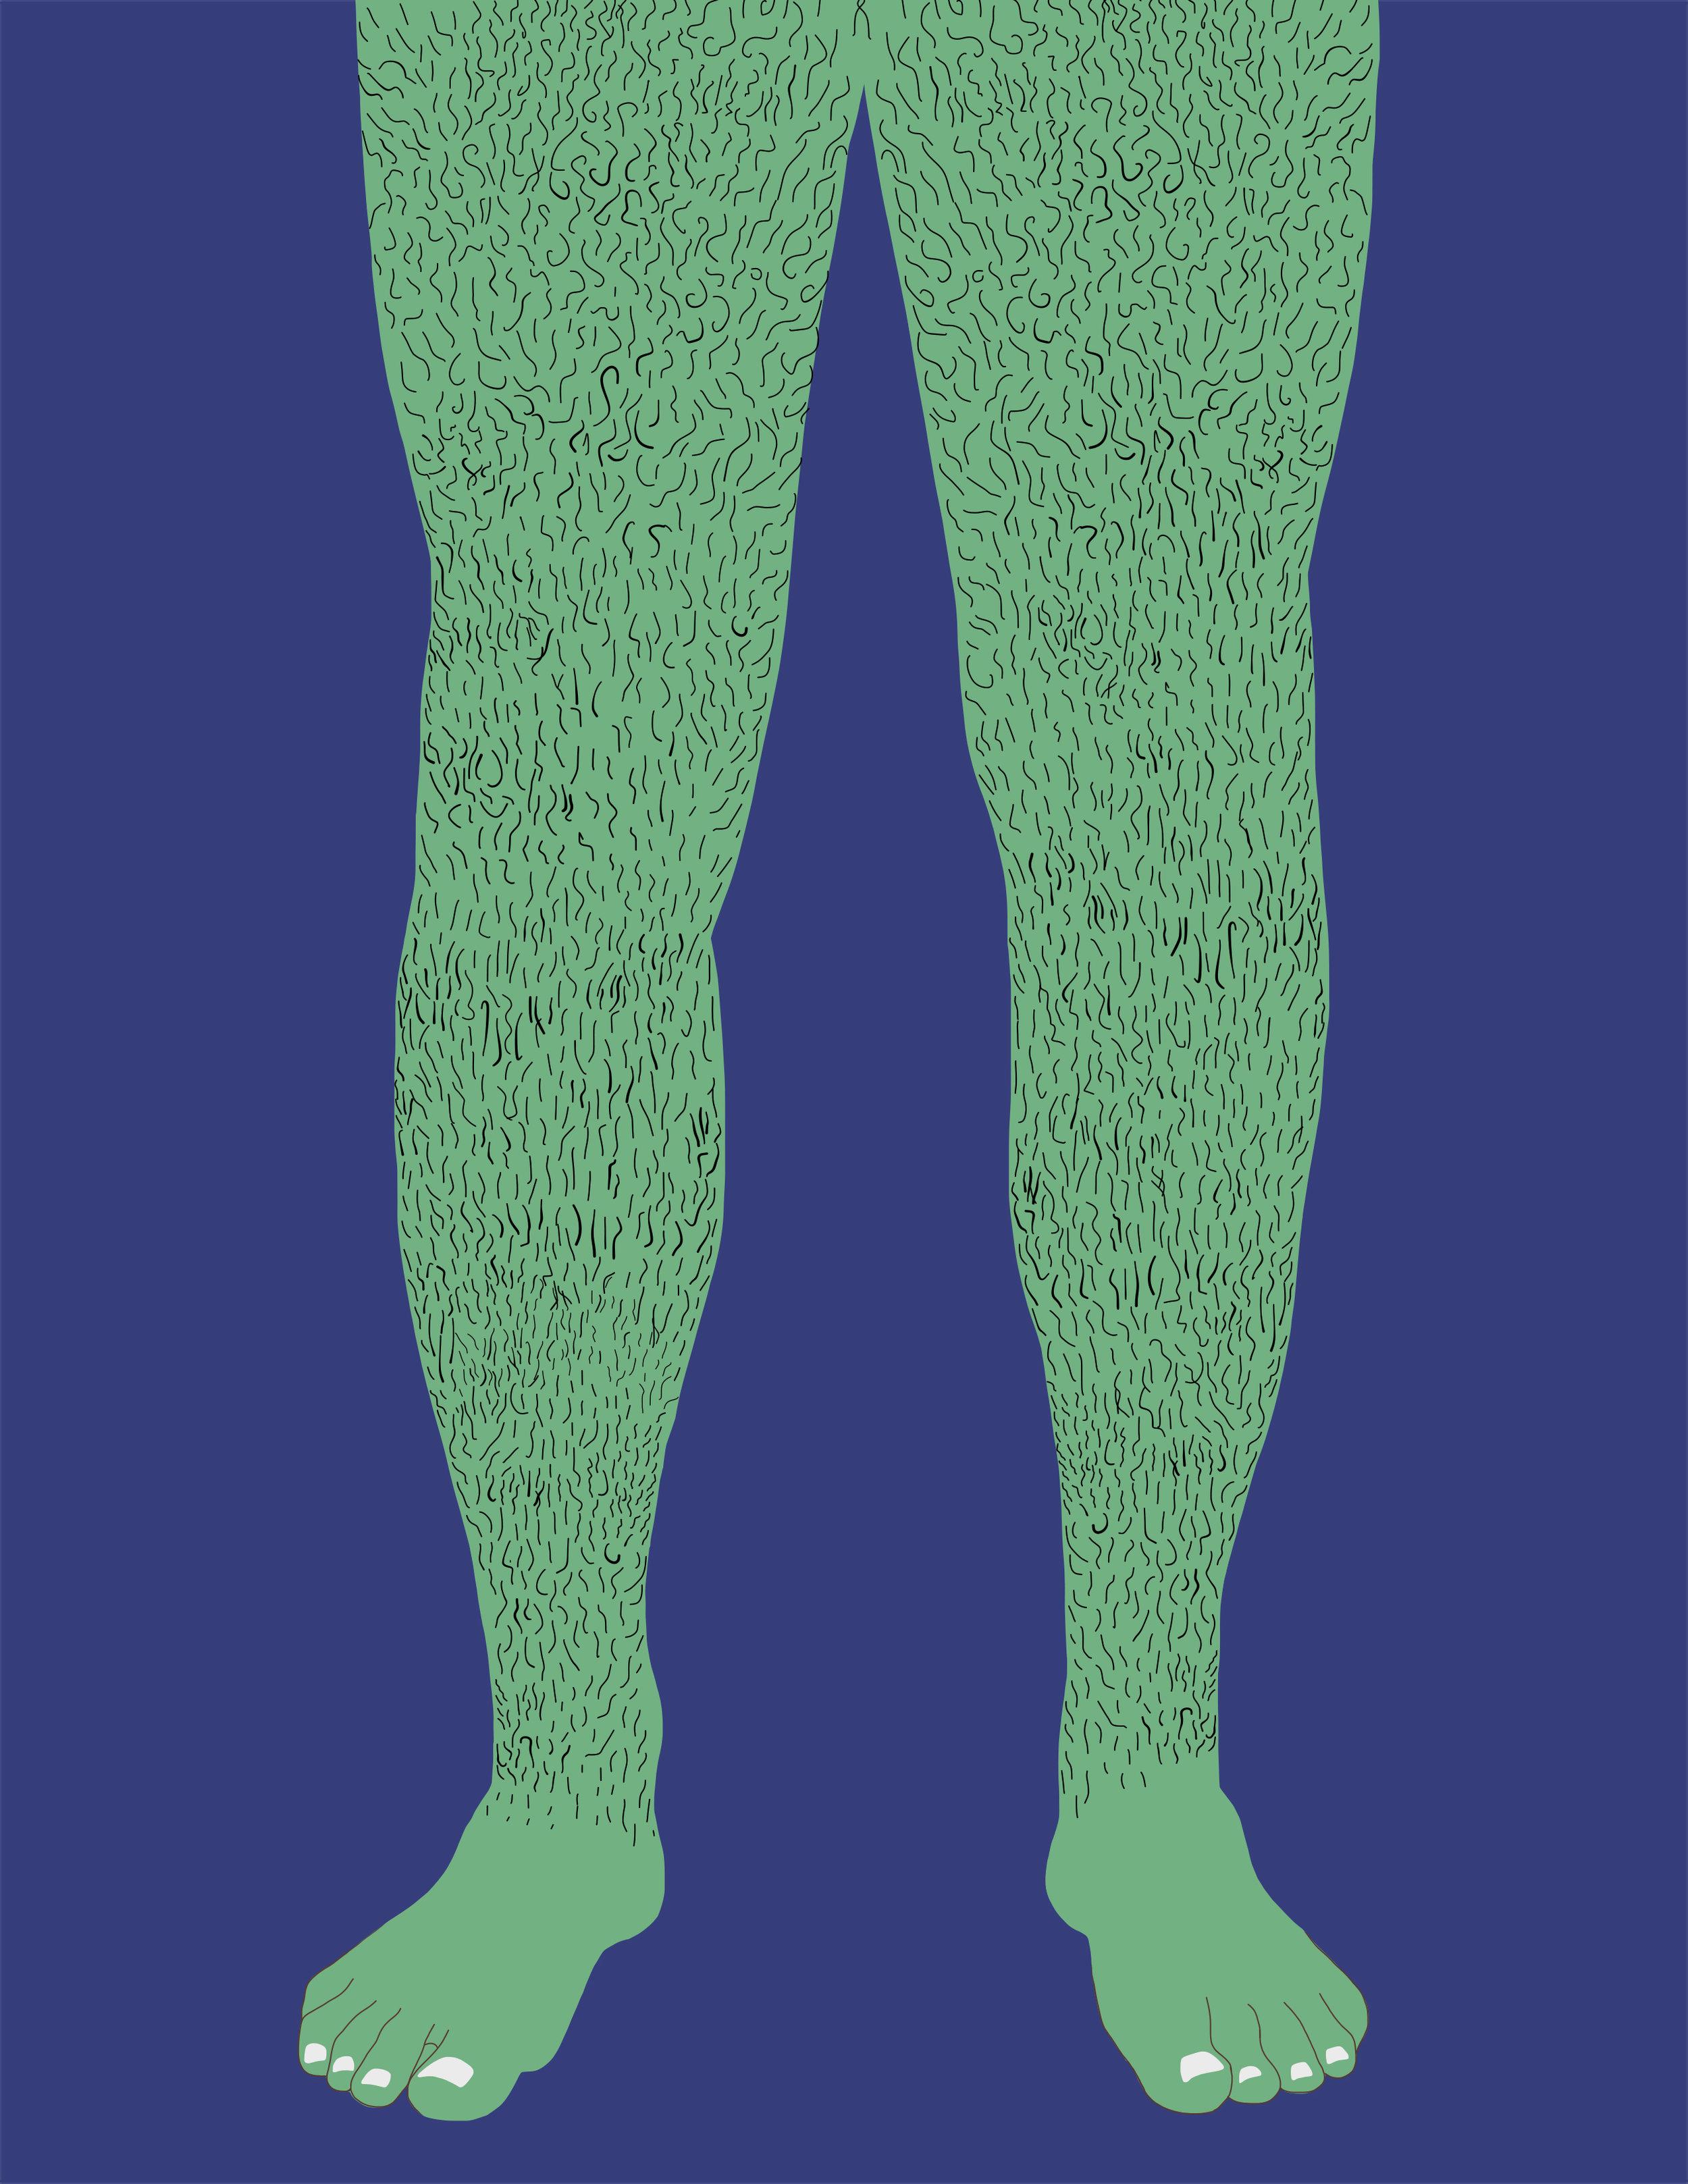 legs_m.jpg